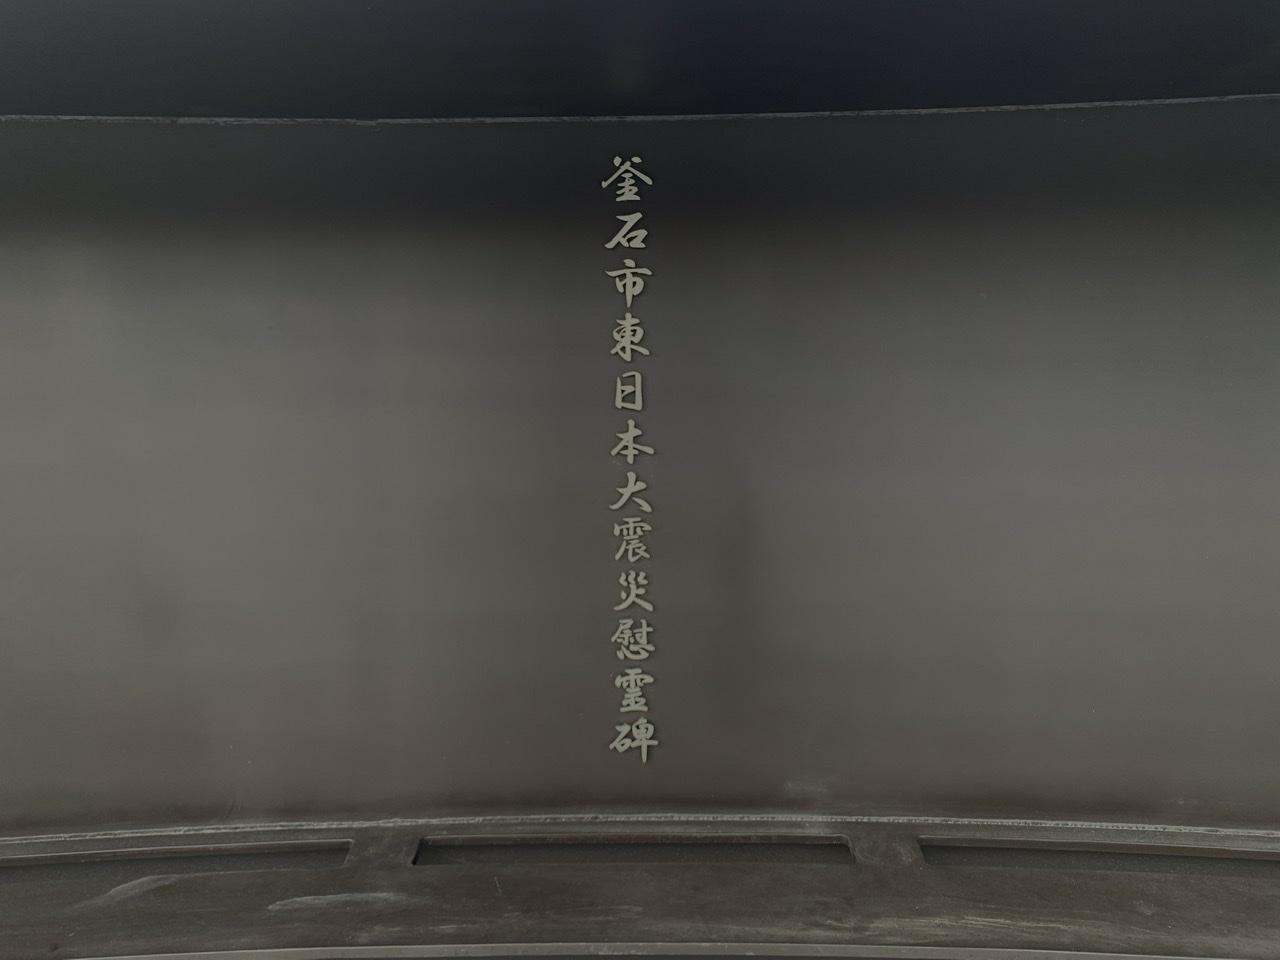 f:id:tetsuya0723:20191117192007j:plain